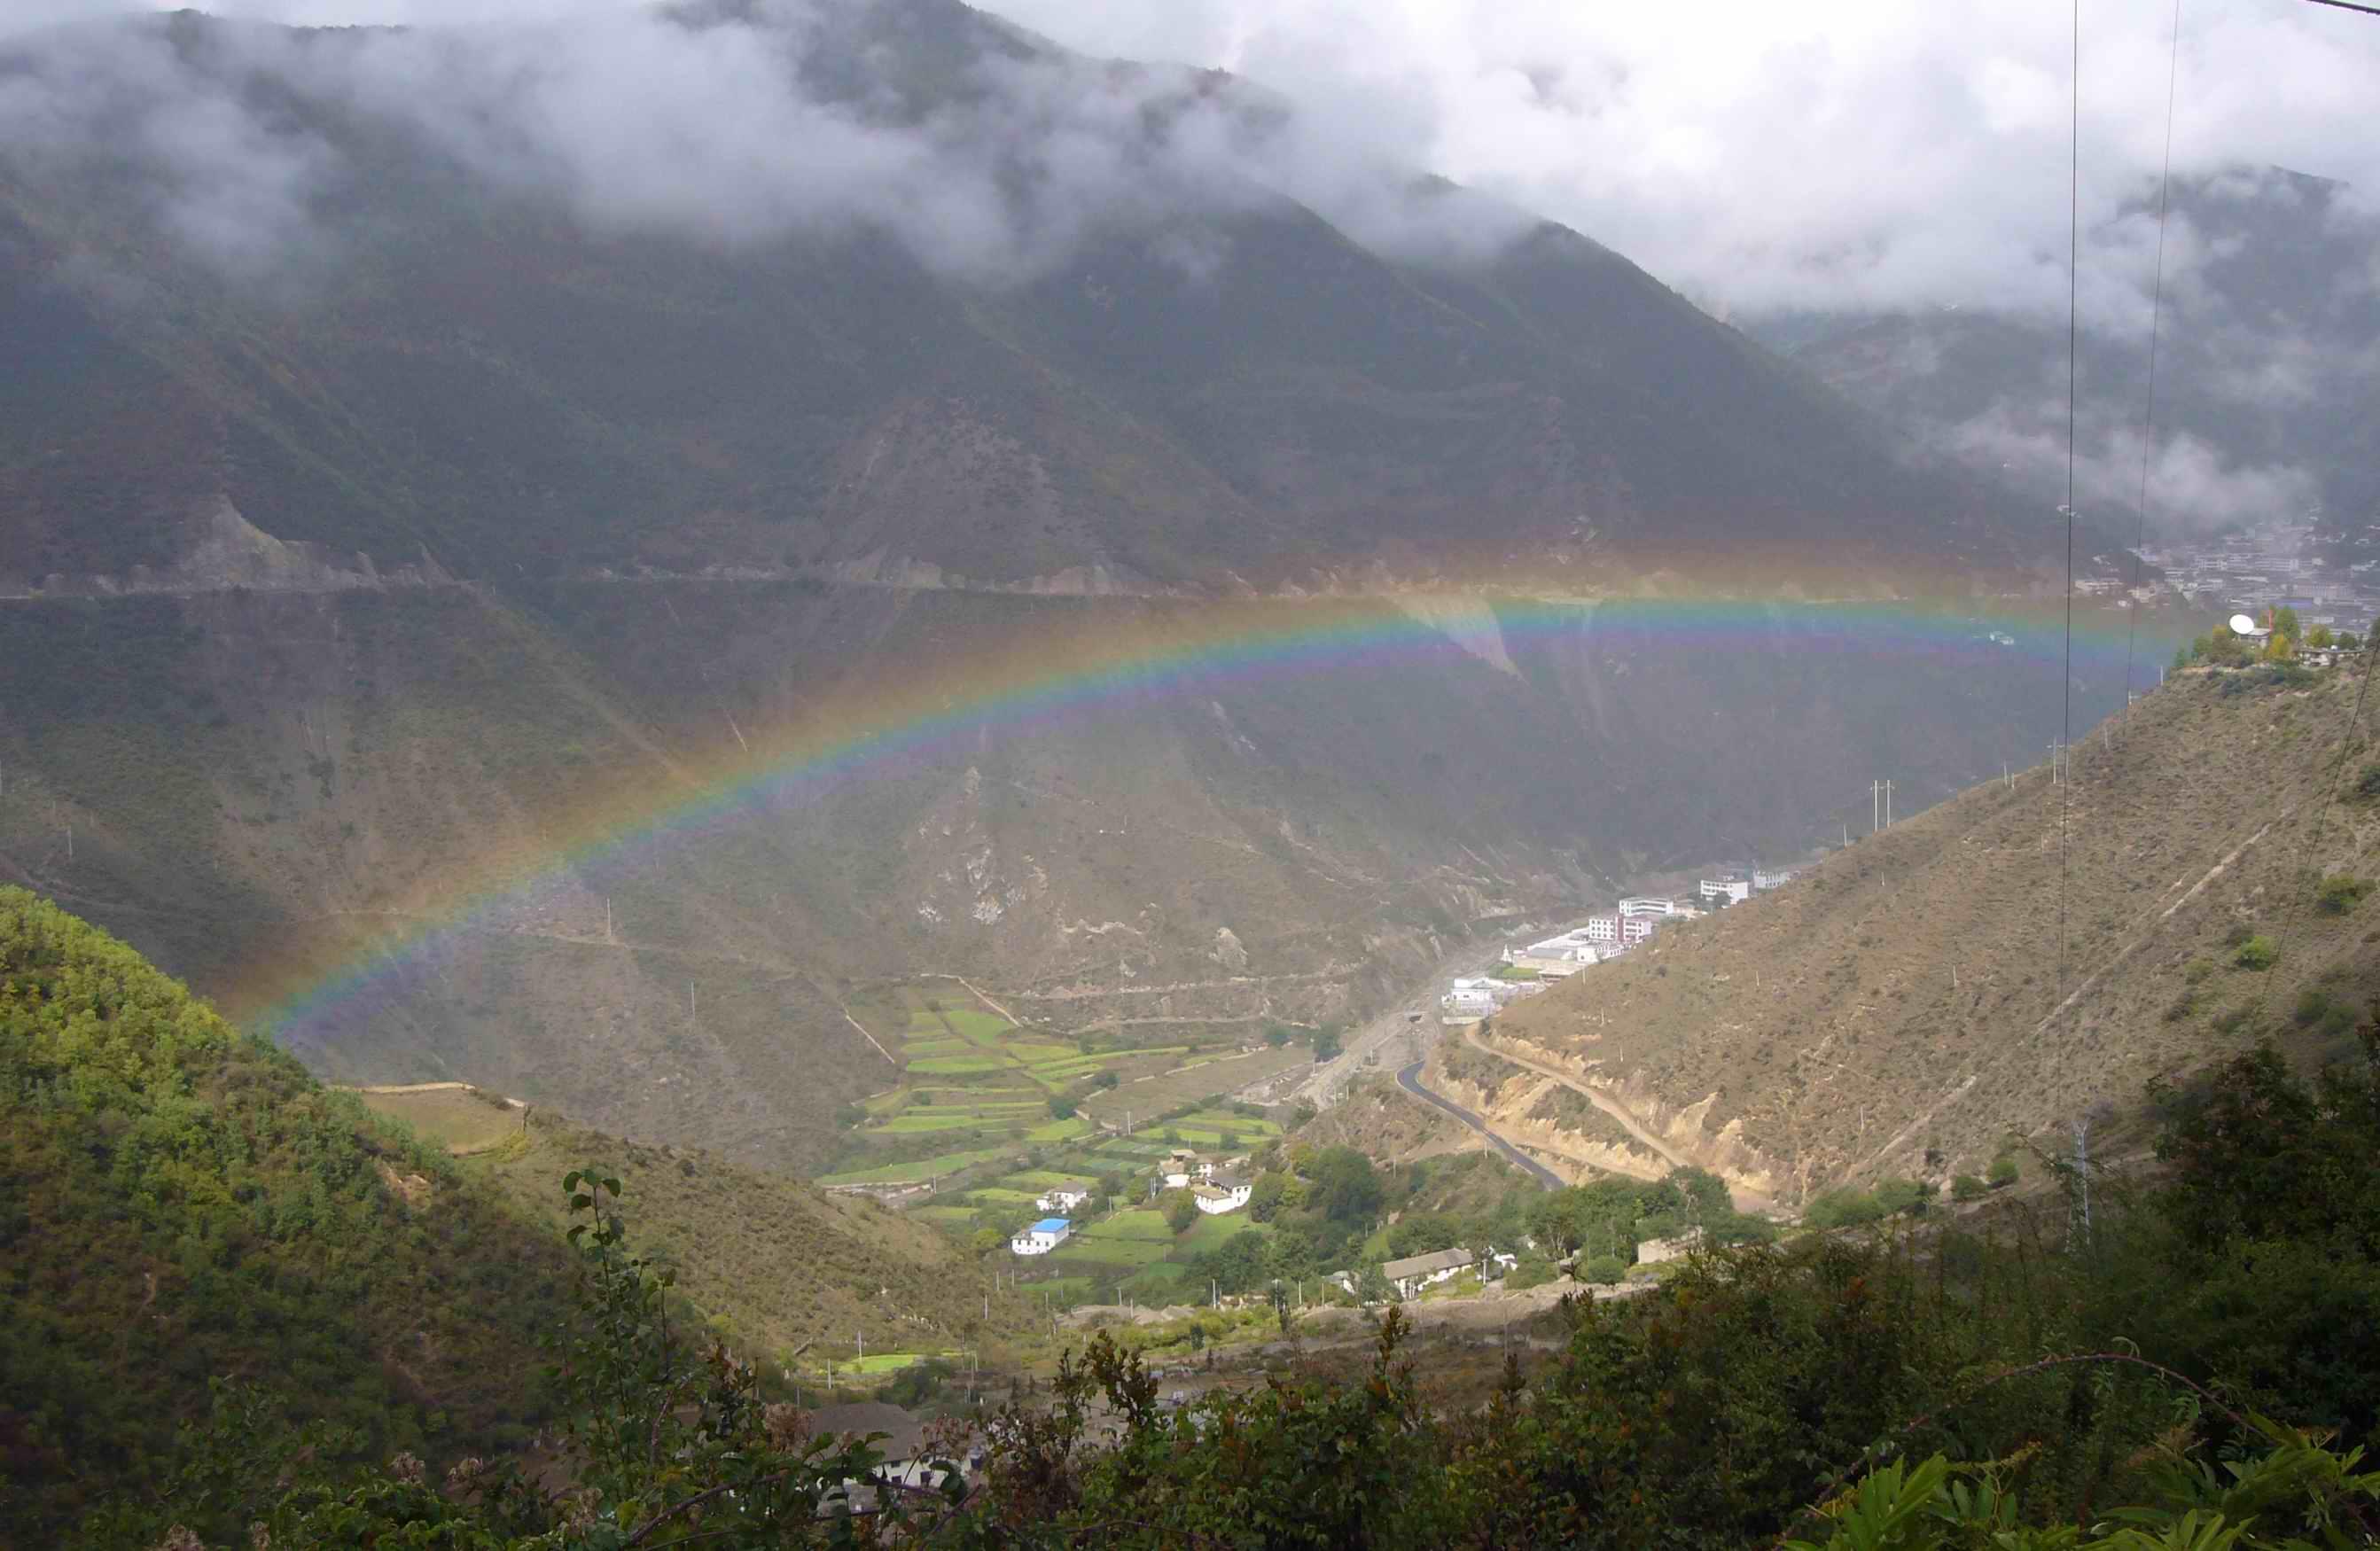 li两道彩虹 风景图片